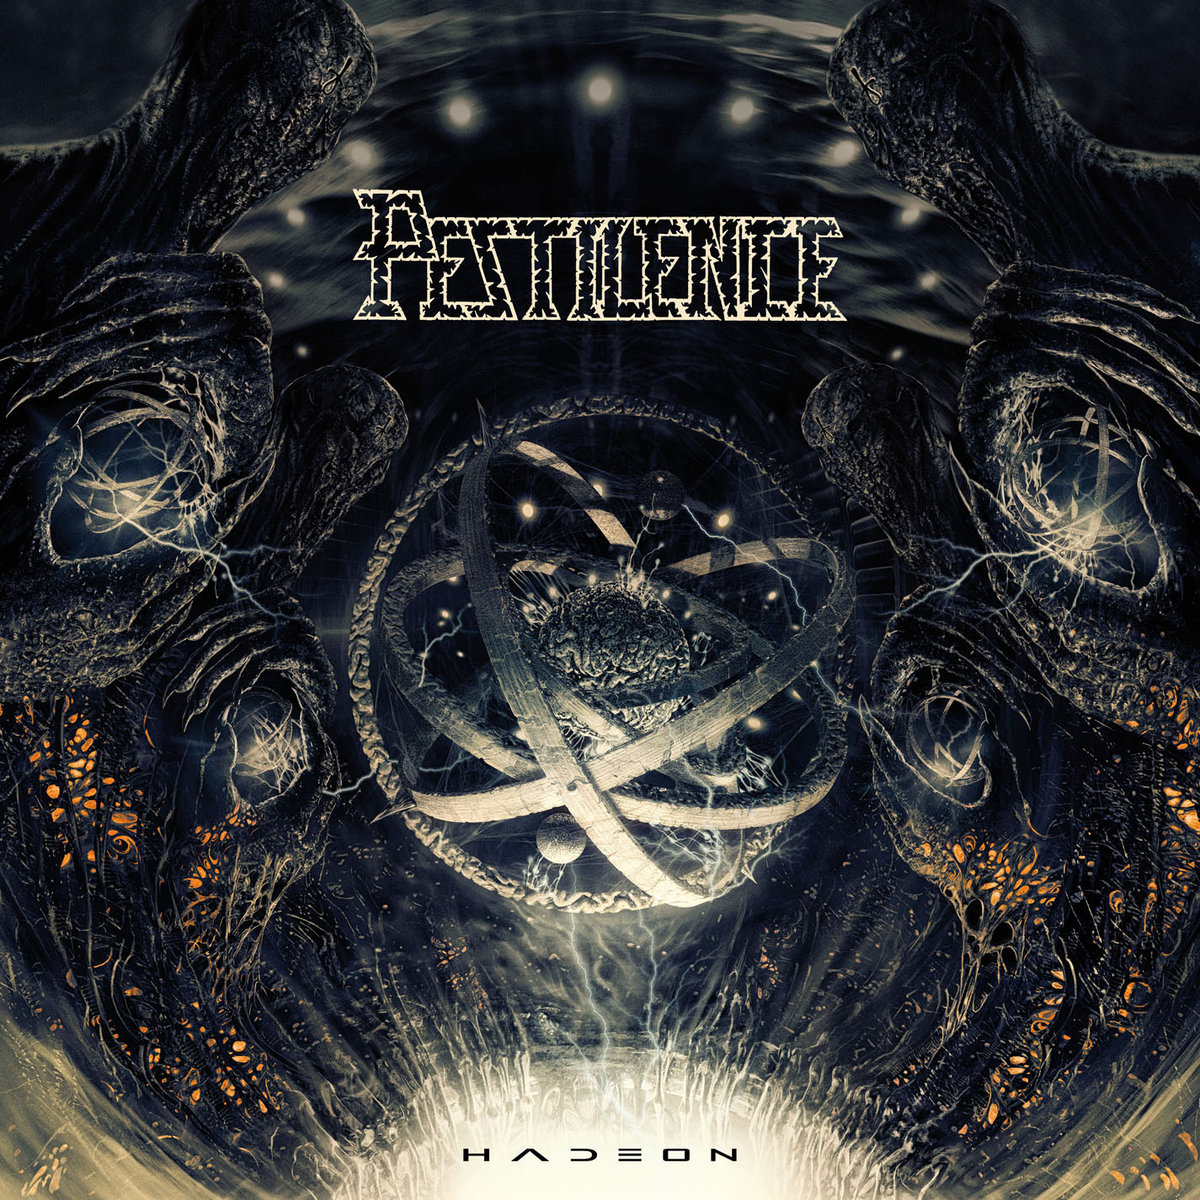 Pestilence - Hadeon - 2018